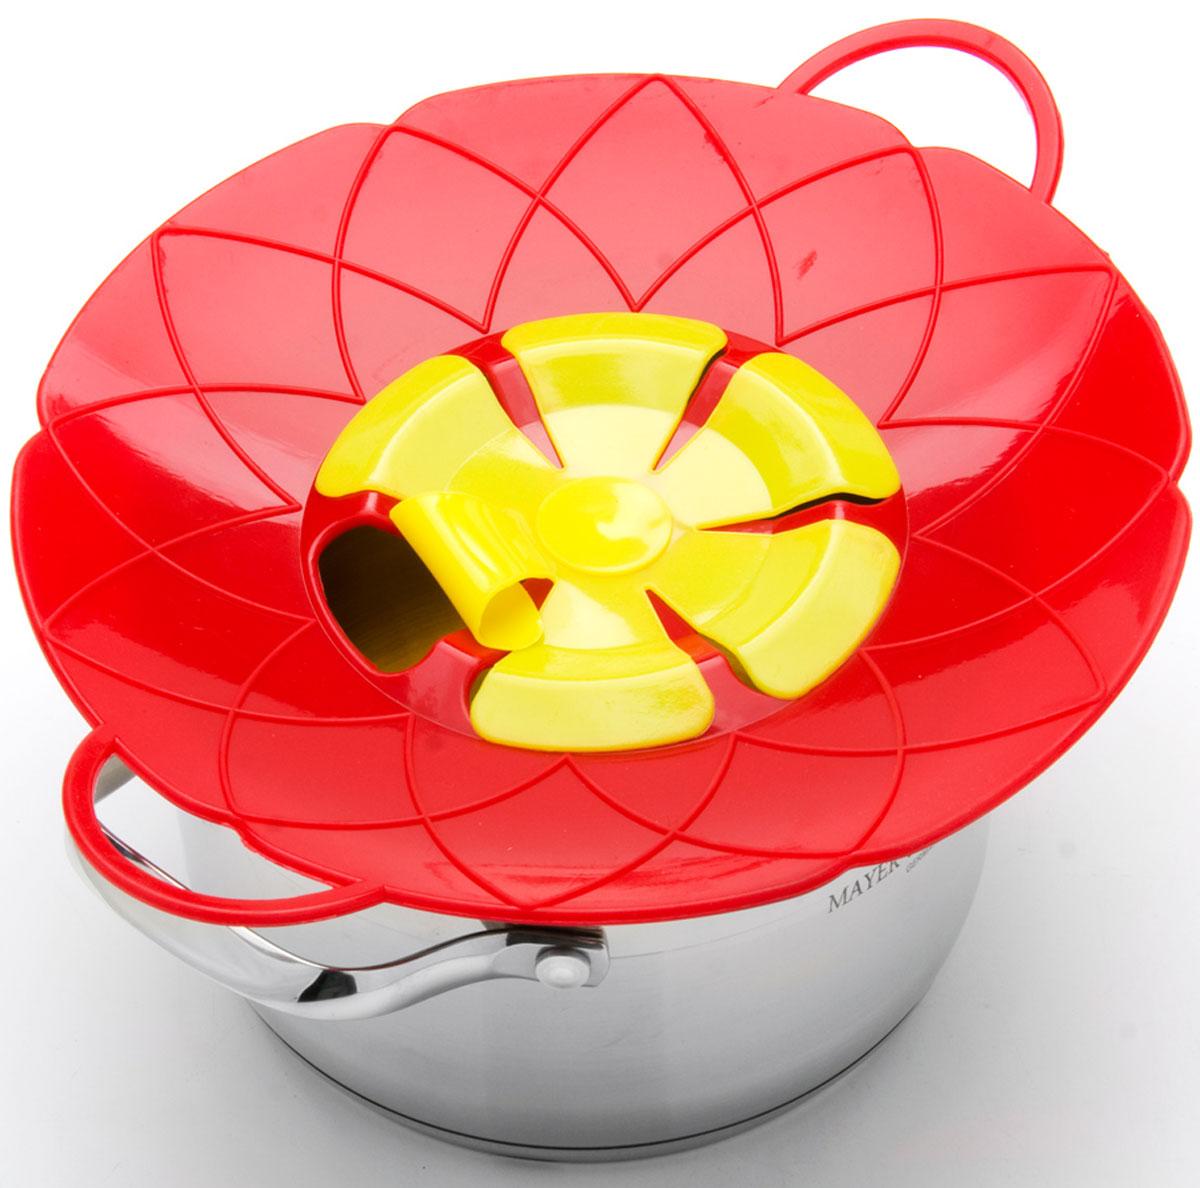 Крышка-невыкипайка Mayer & Boch, цвет: красный, желтый, диаметр 25 см крышка невыкипайка mayer